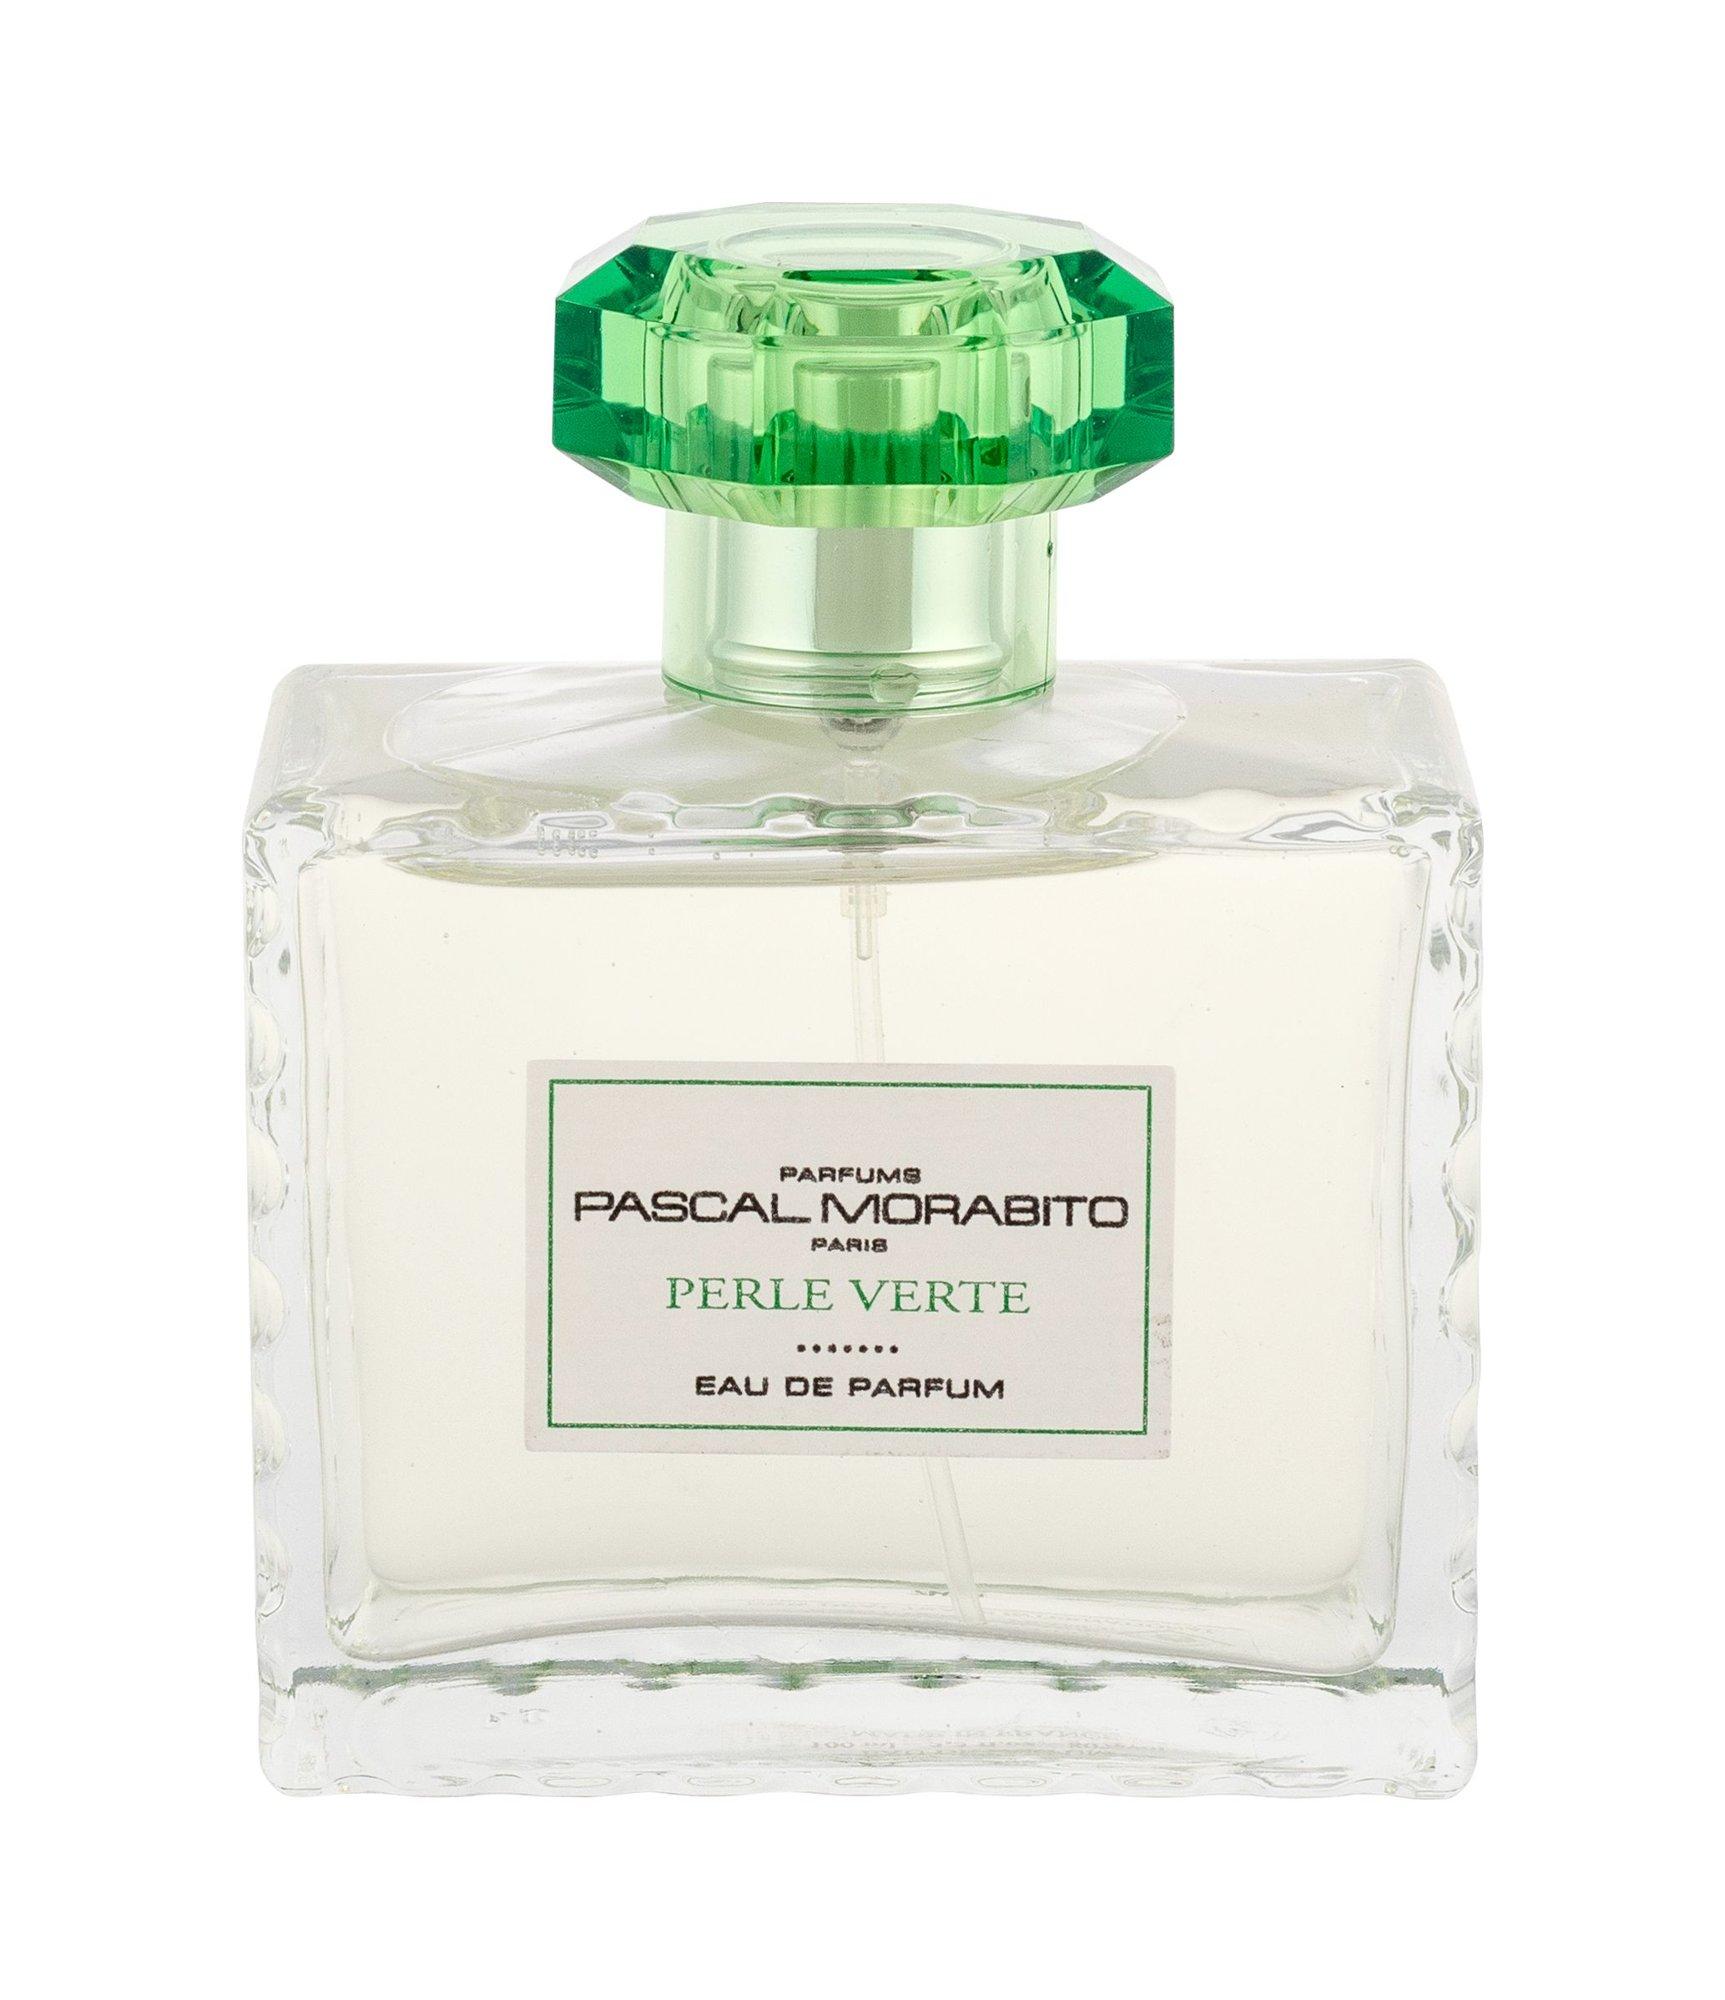 Pascal Morabito Perle Verte Eau de Parfum 100ml